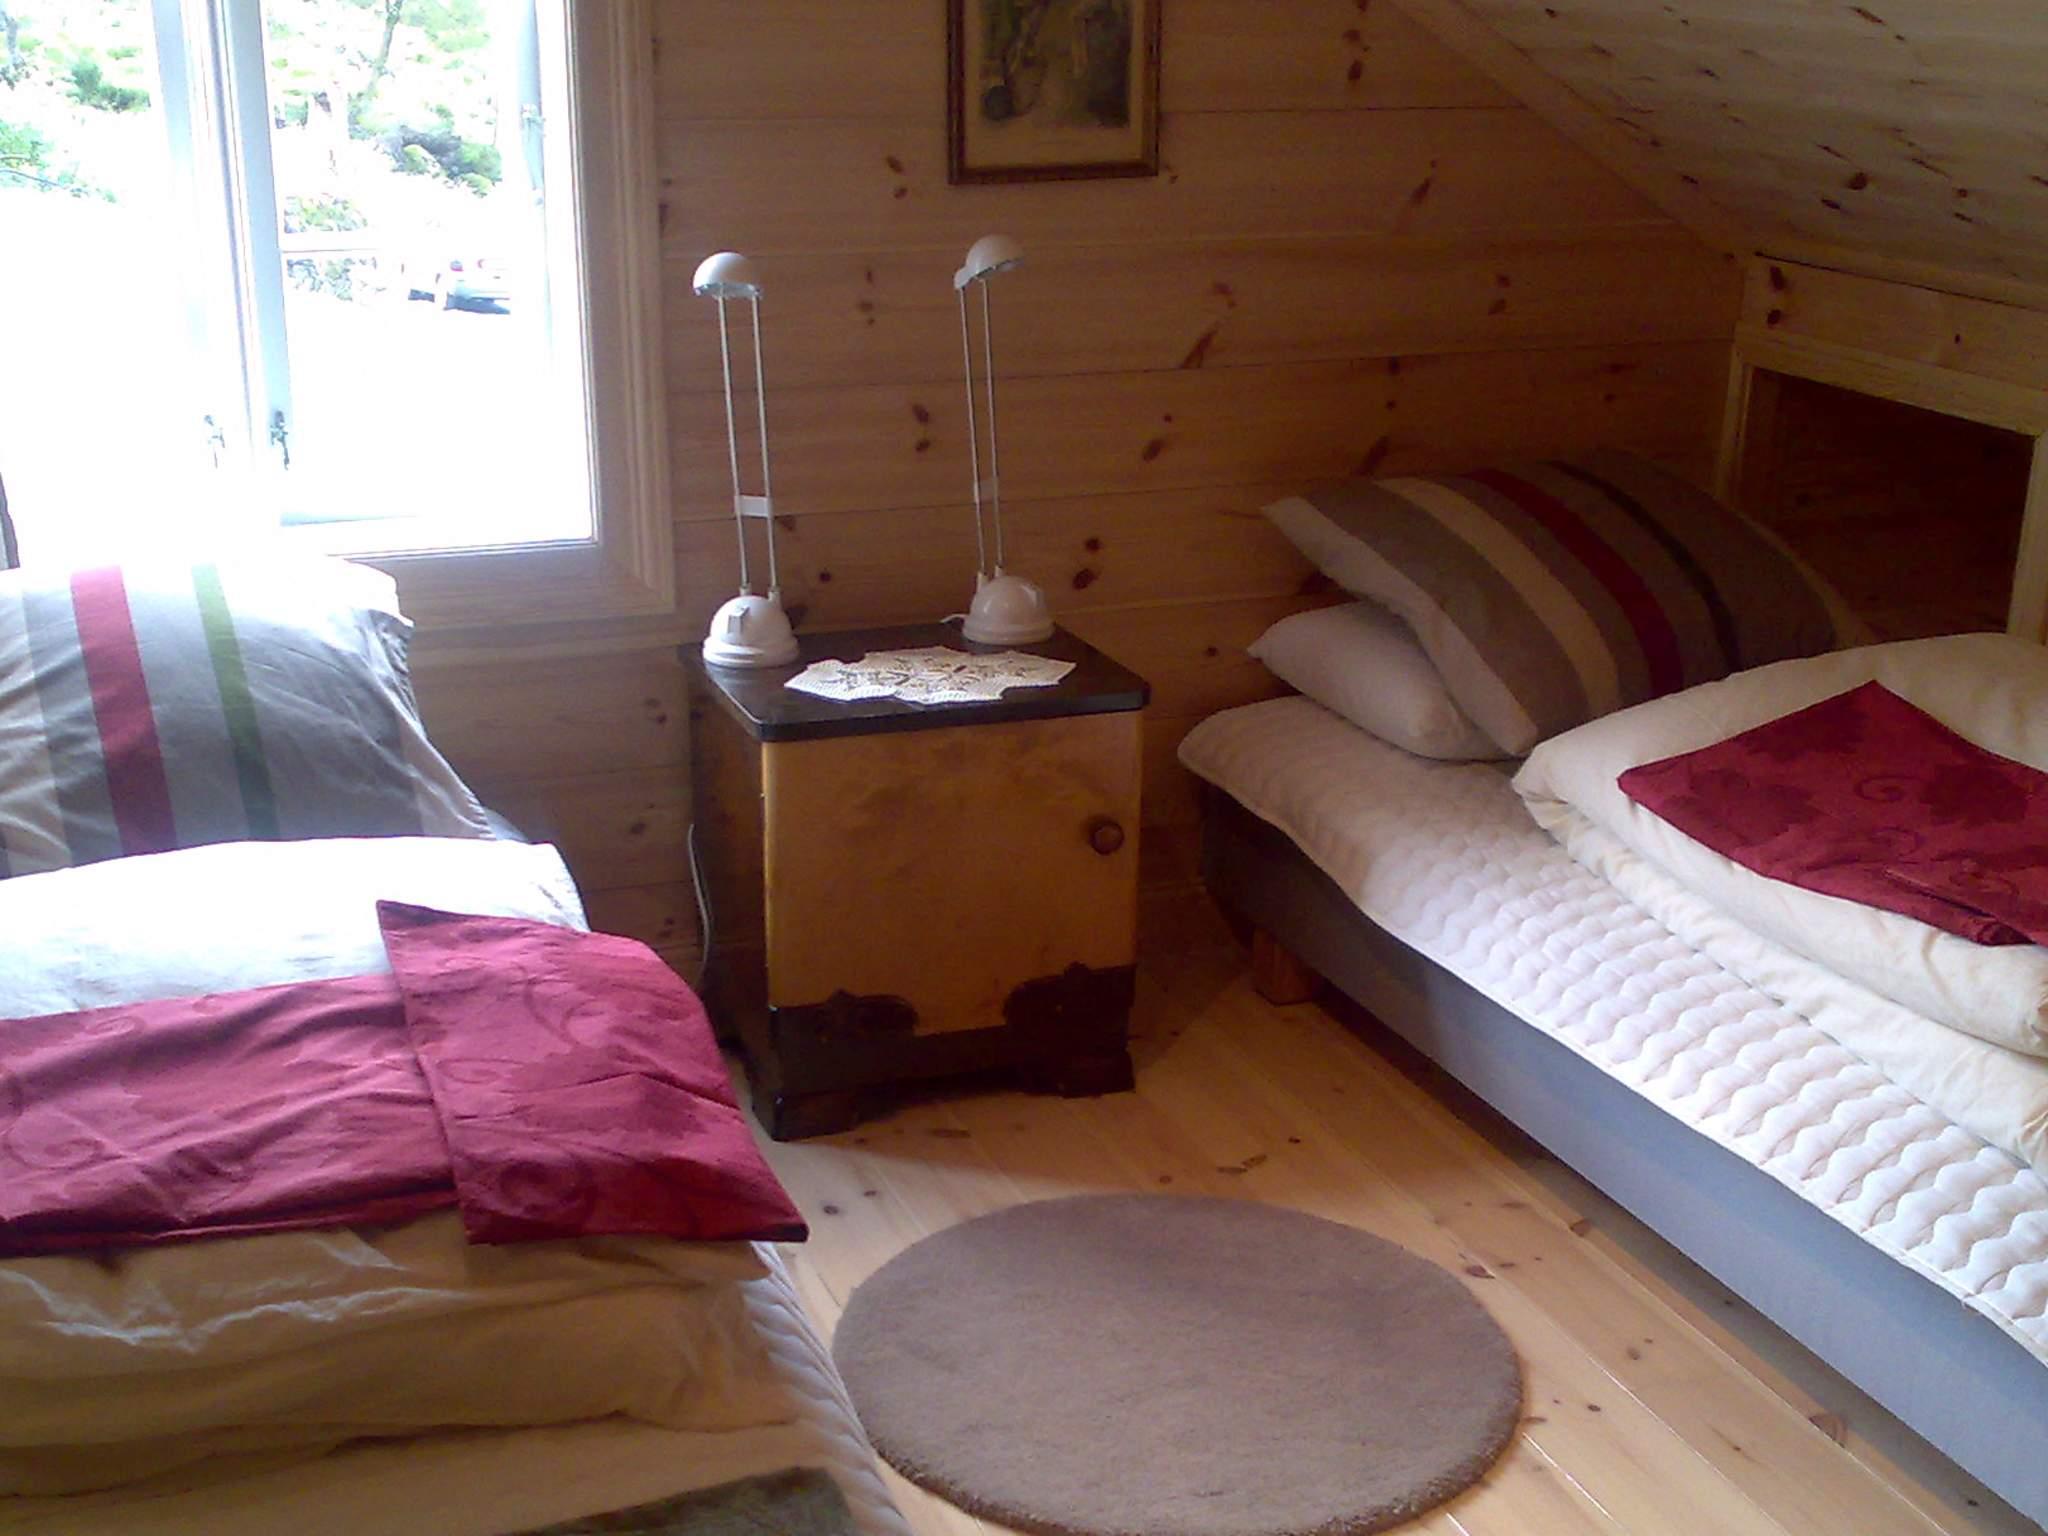 Ferienhaus Heskestad (252727), Ualand, Rogaland - Boknalfjord, Westnorwegen, Norwegen, Bild 9